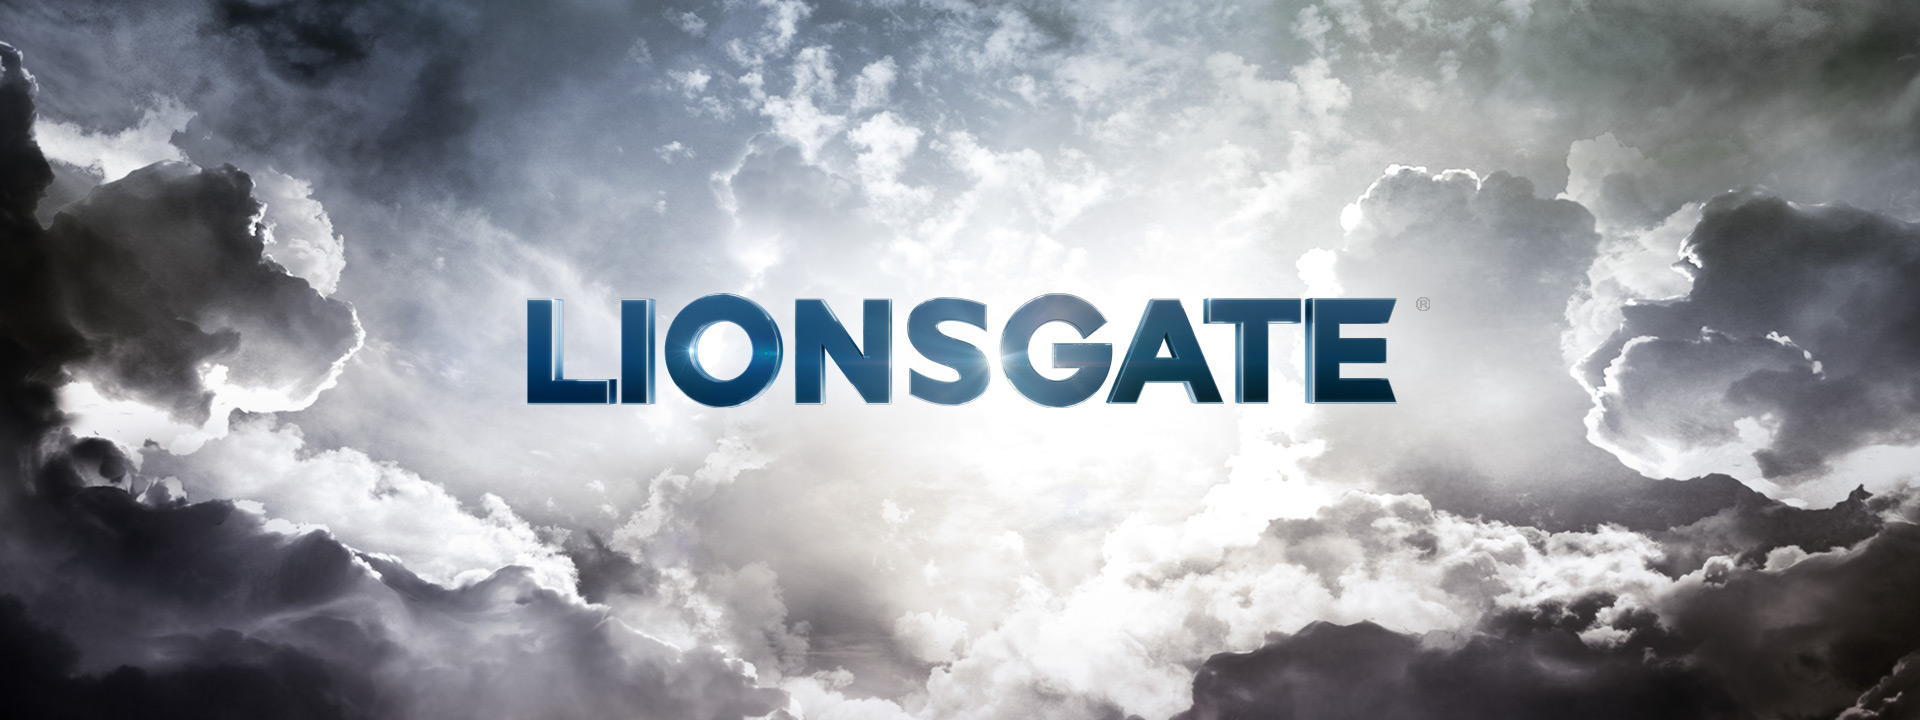 lionsgate logo image